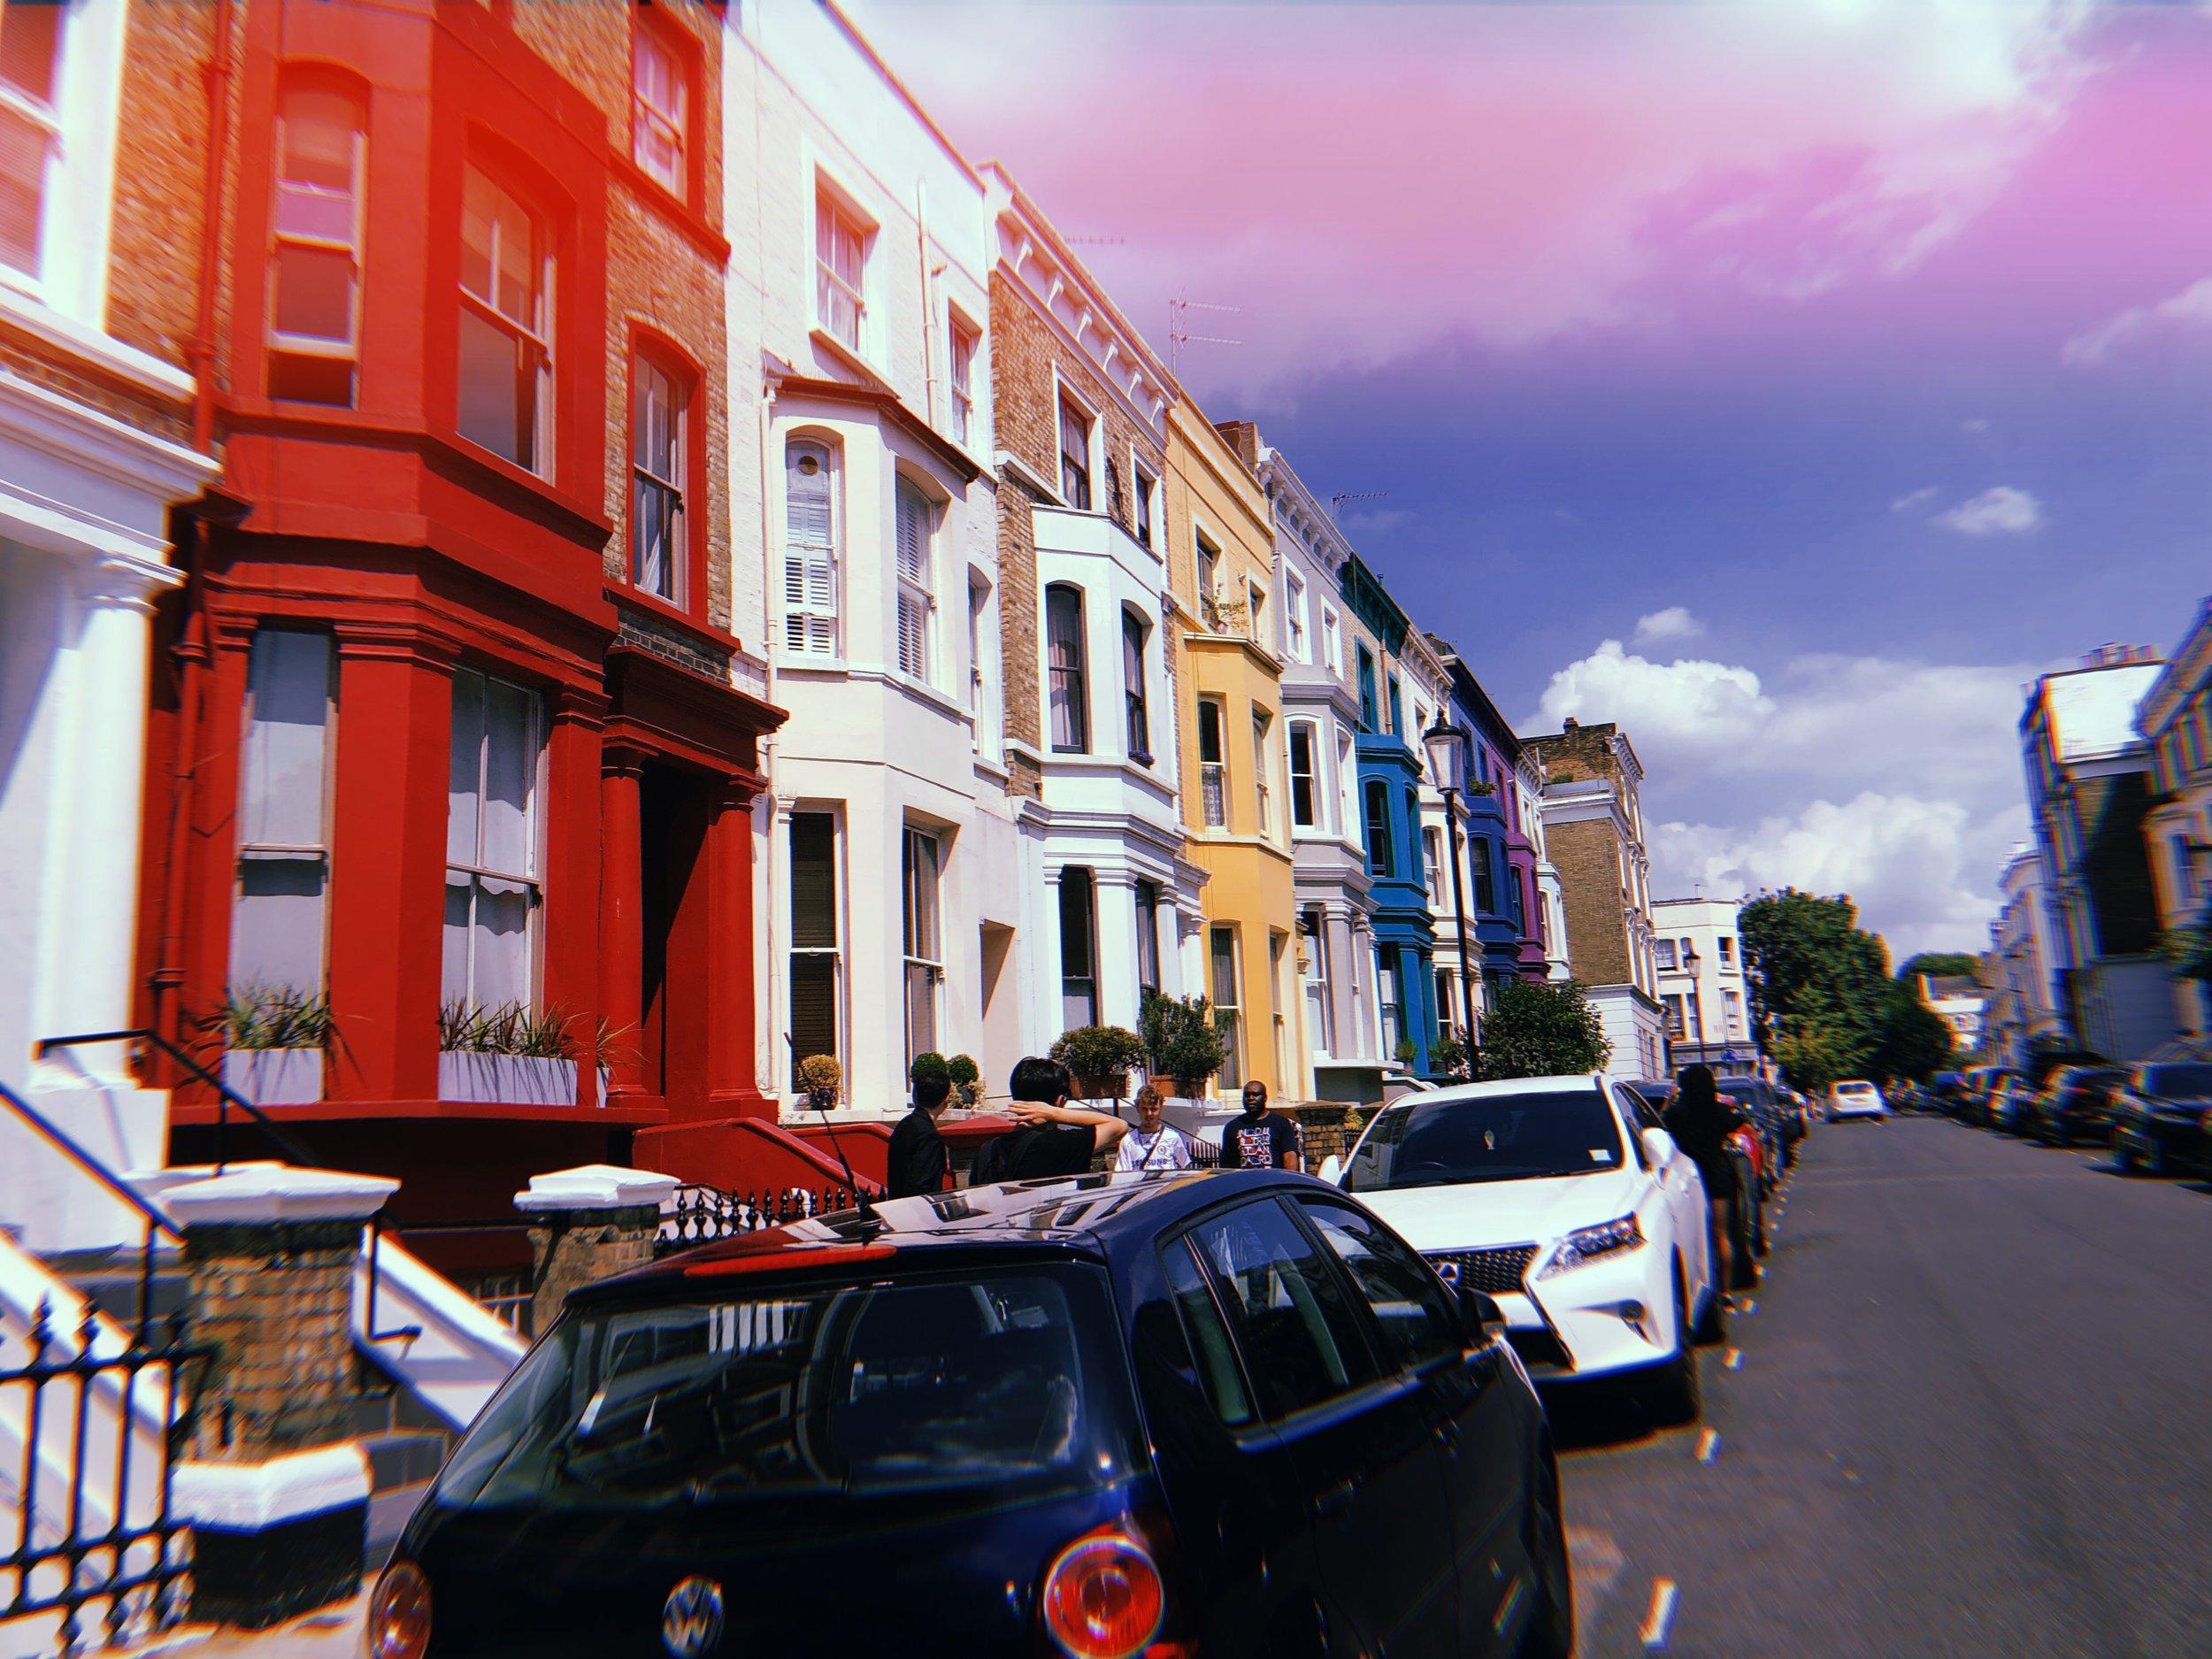 Lancaster Rd, Notting Hill